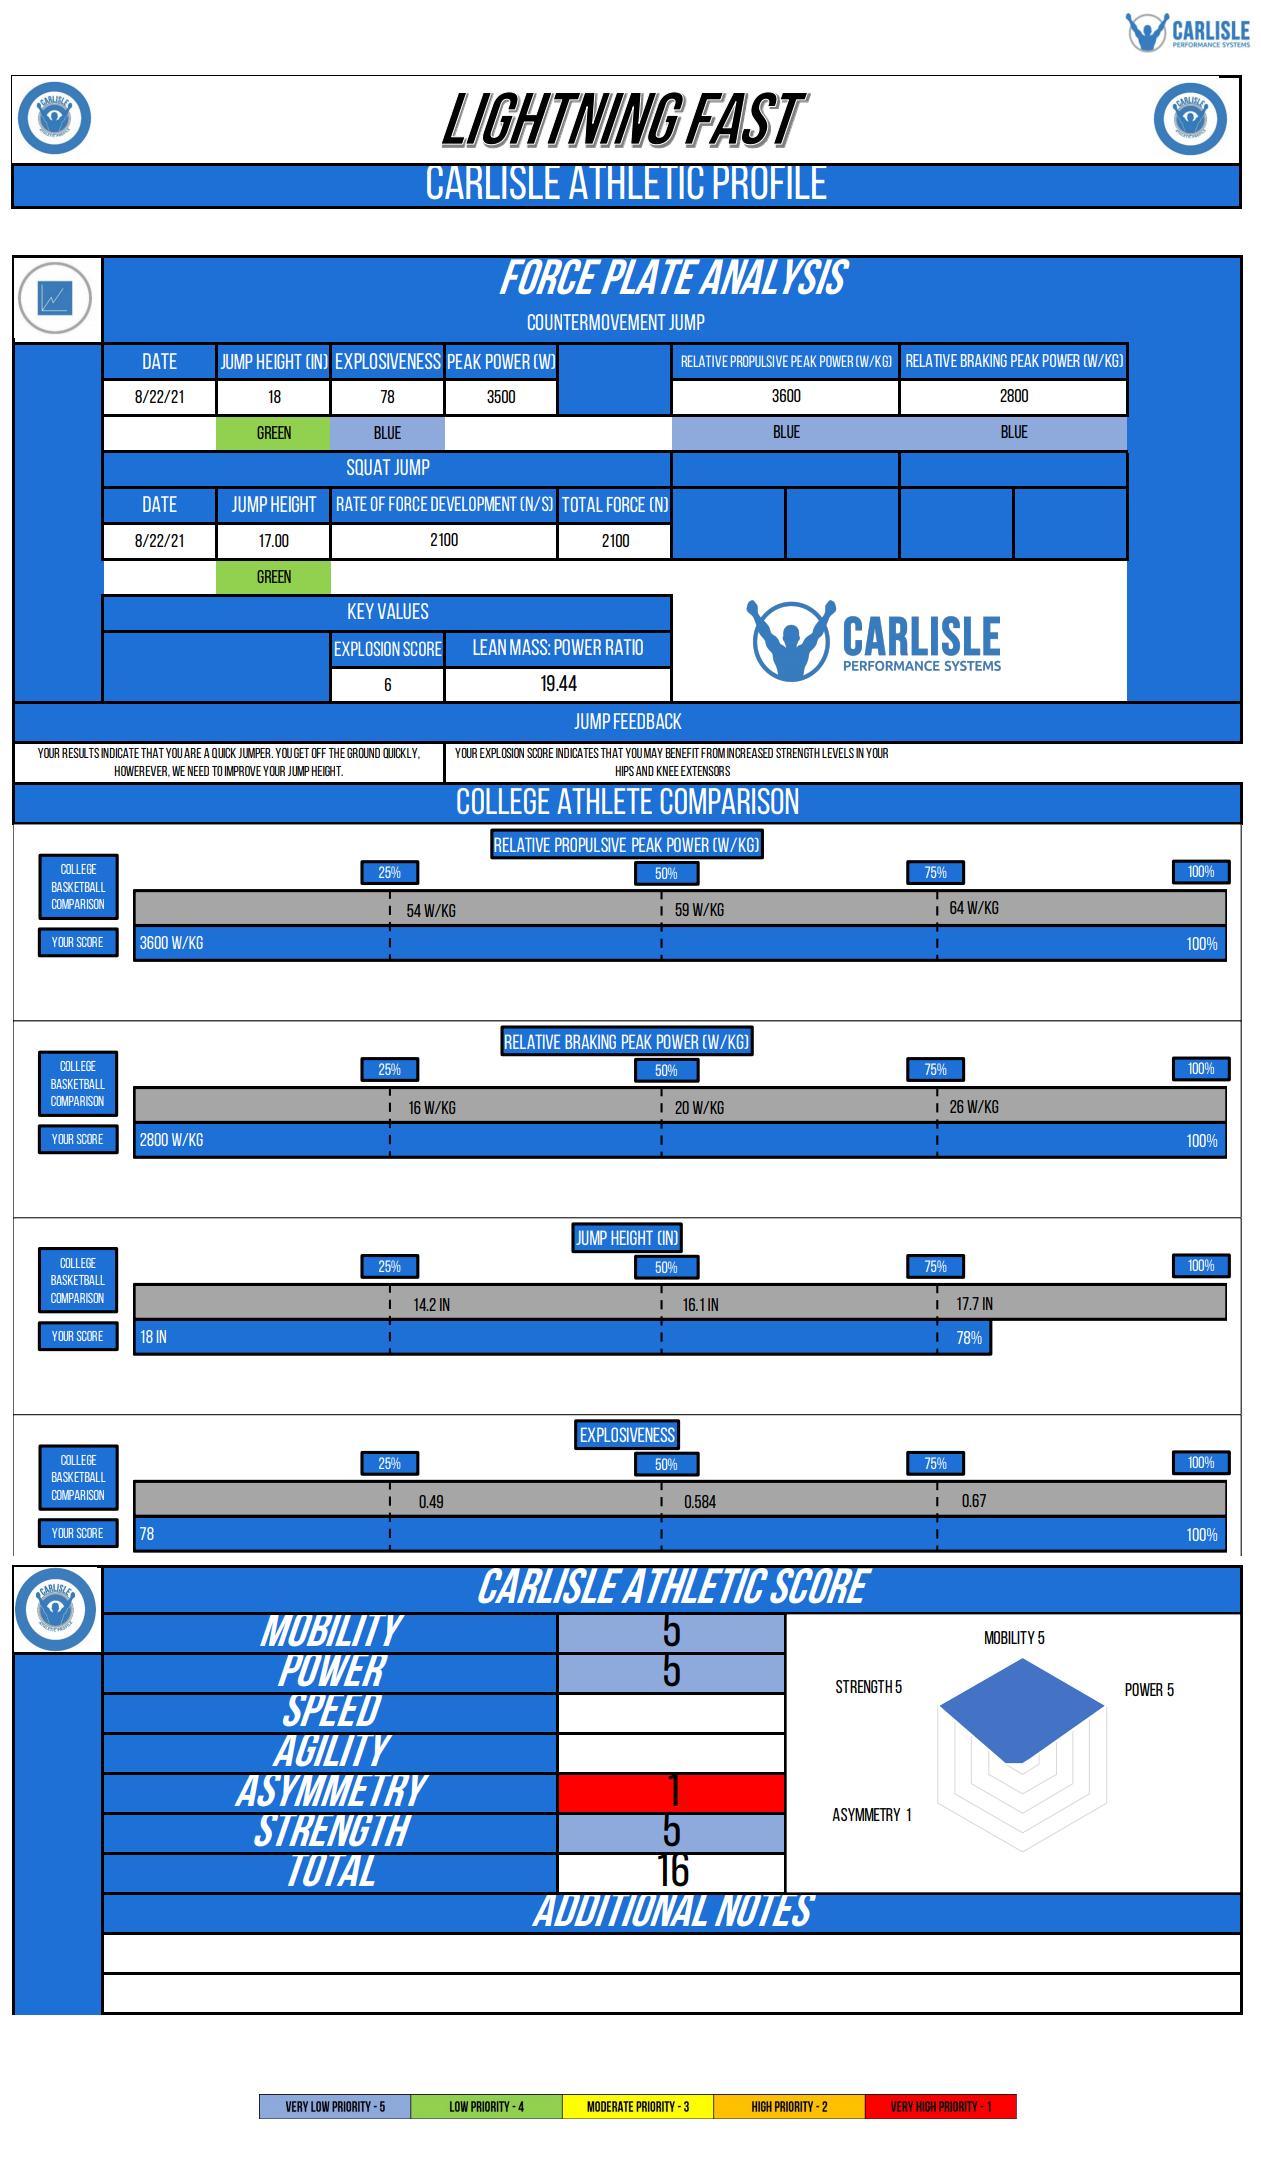 sample athletic assessment test the carlisle athletic profile CAP